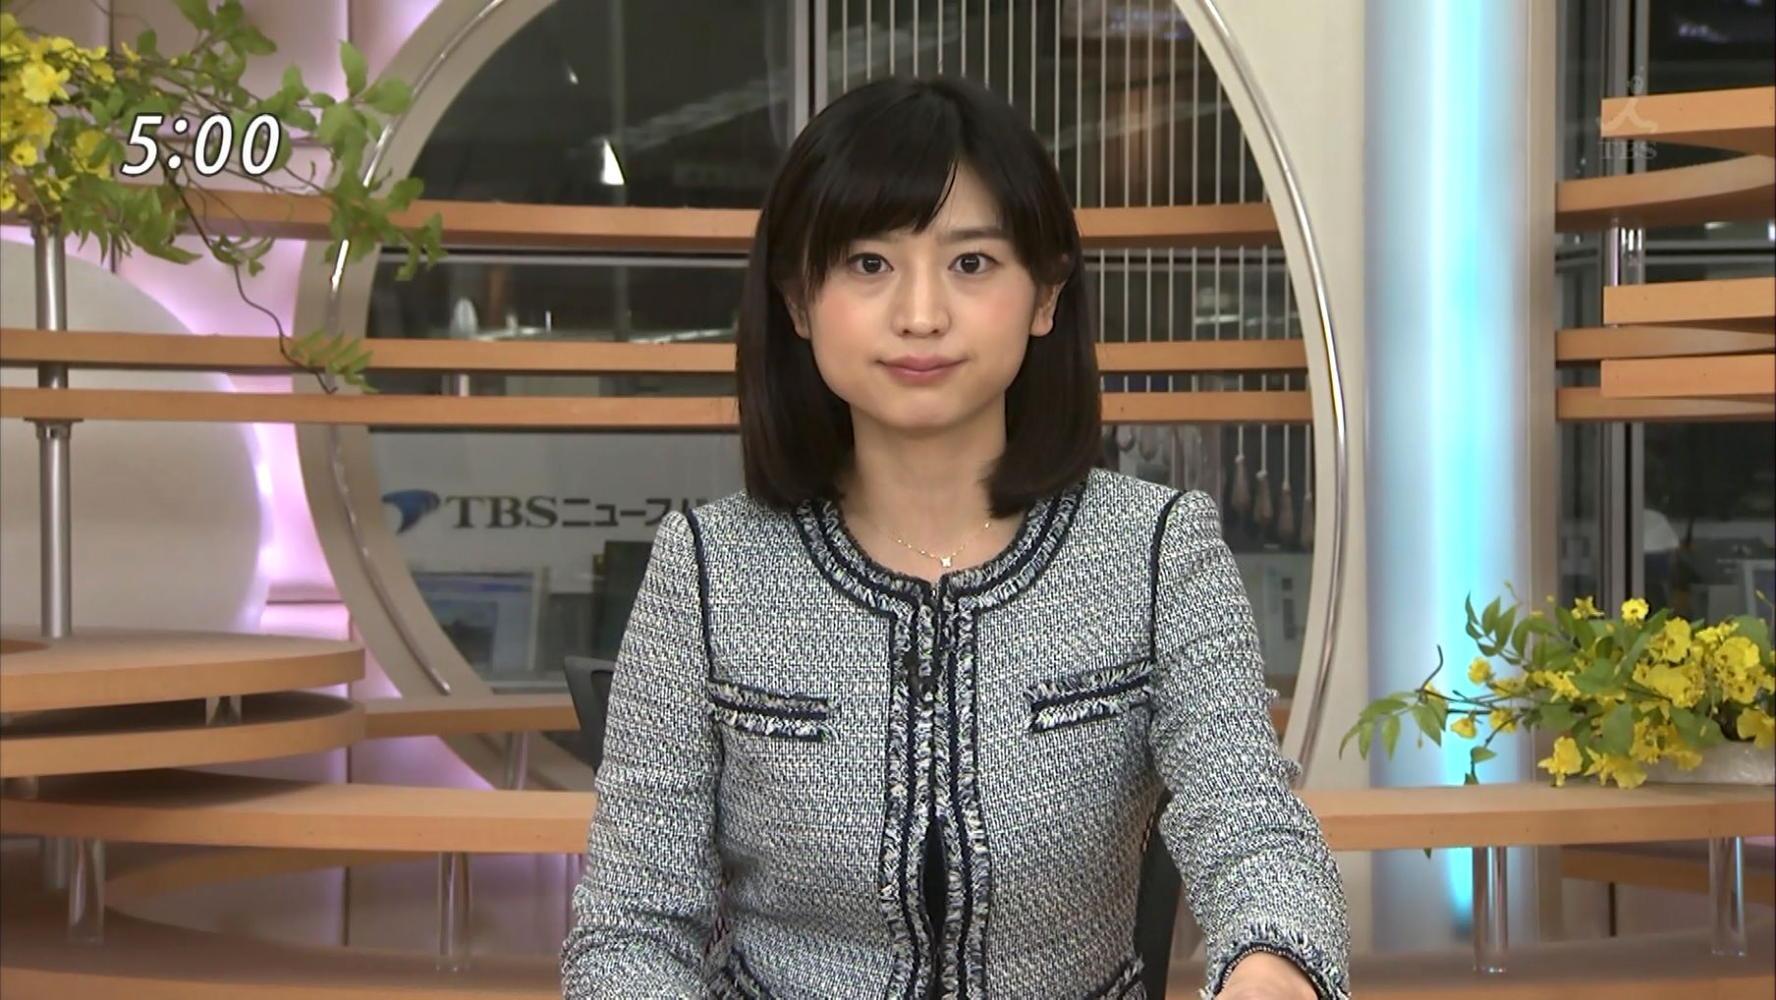 上野優花の画像 p1_11